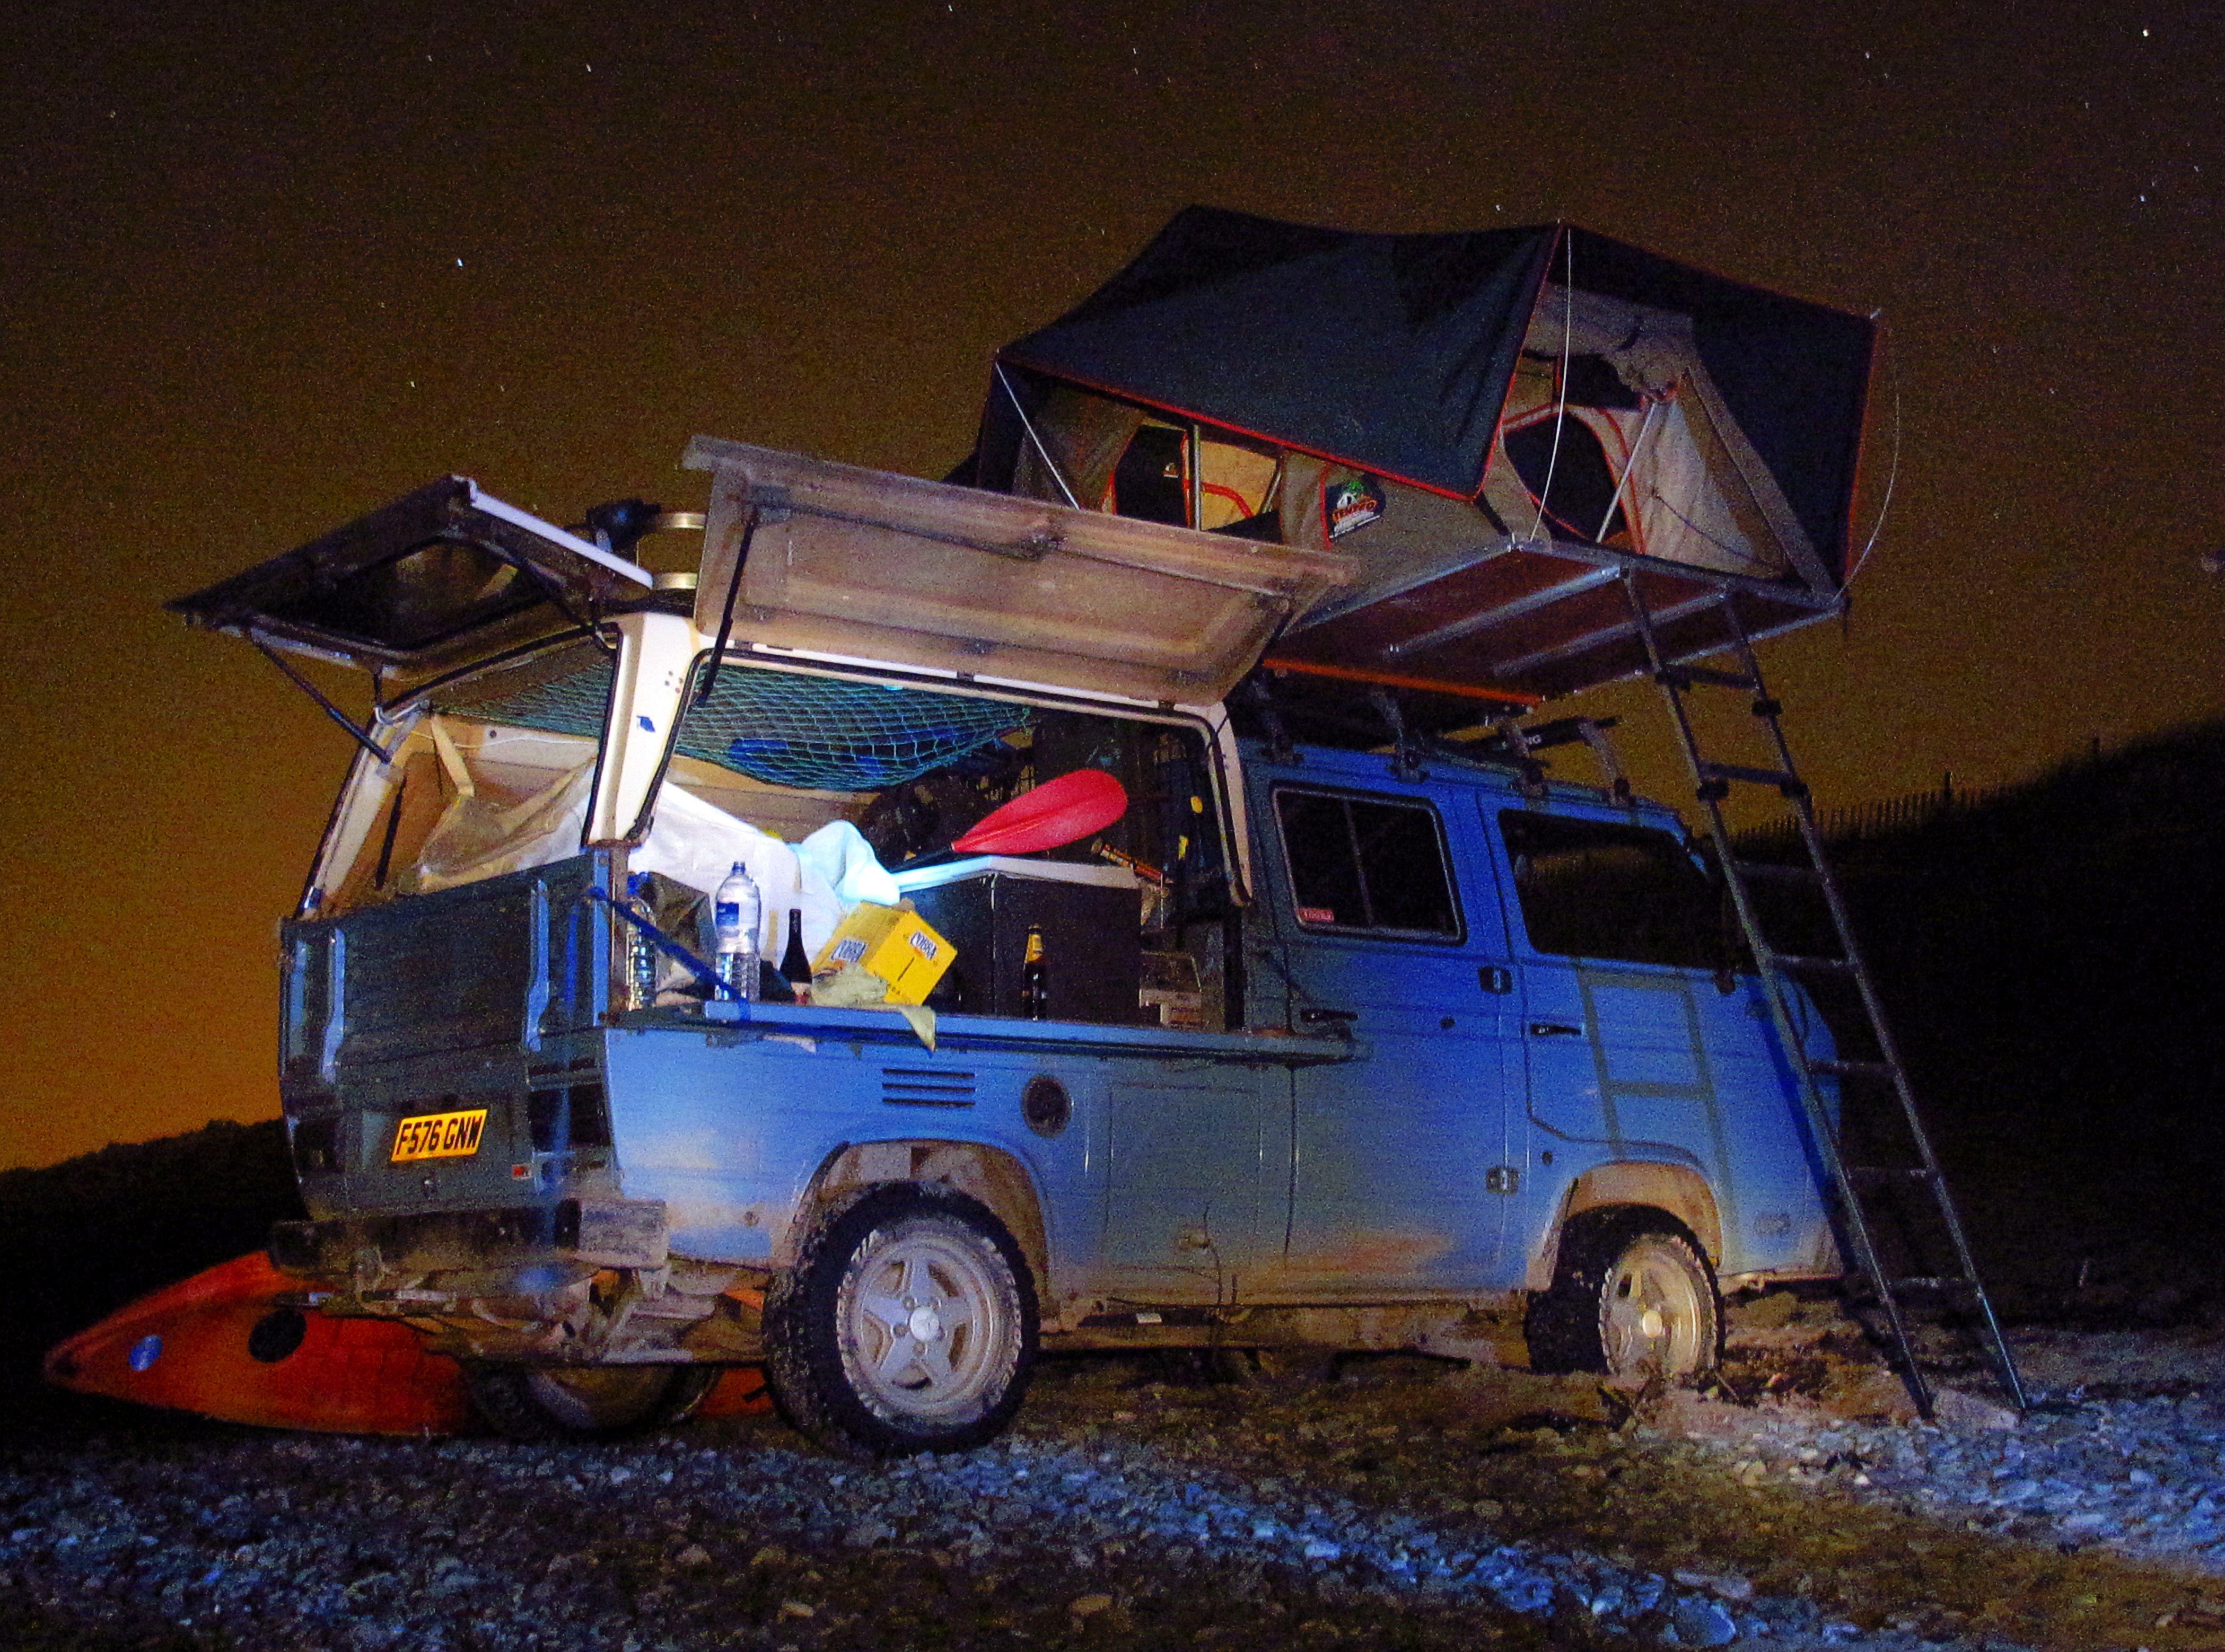 Alternative syncro camper camperising a double cab doka